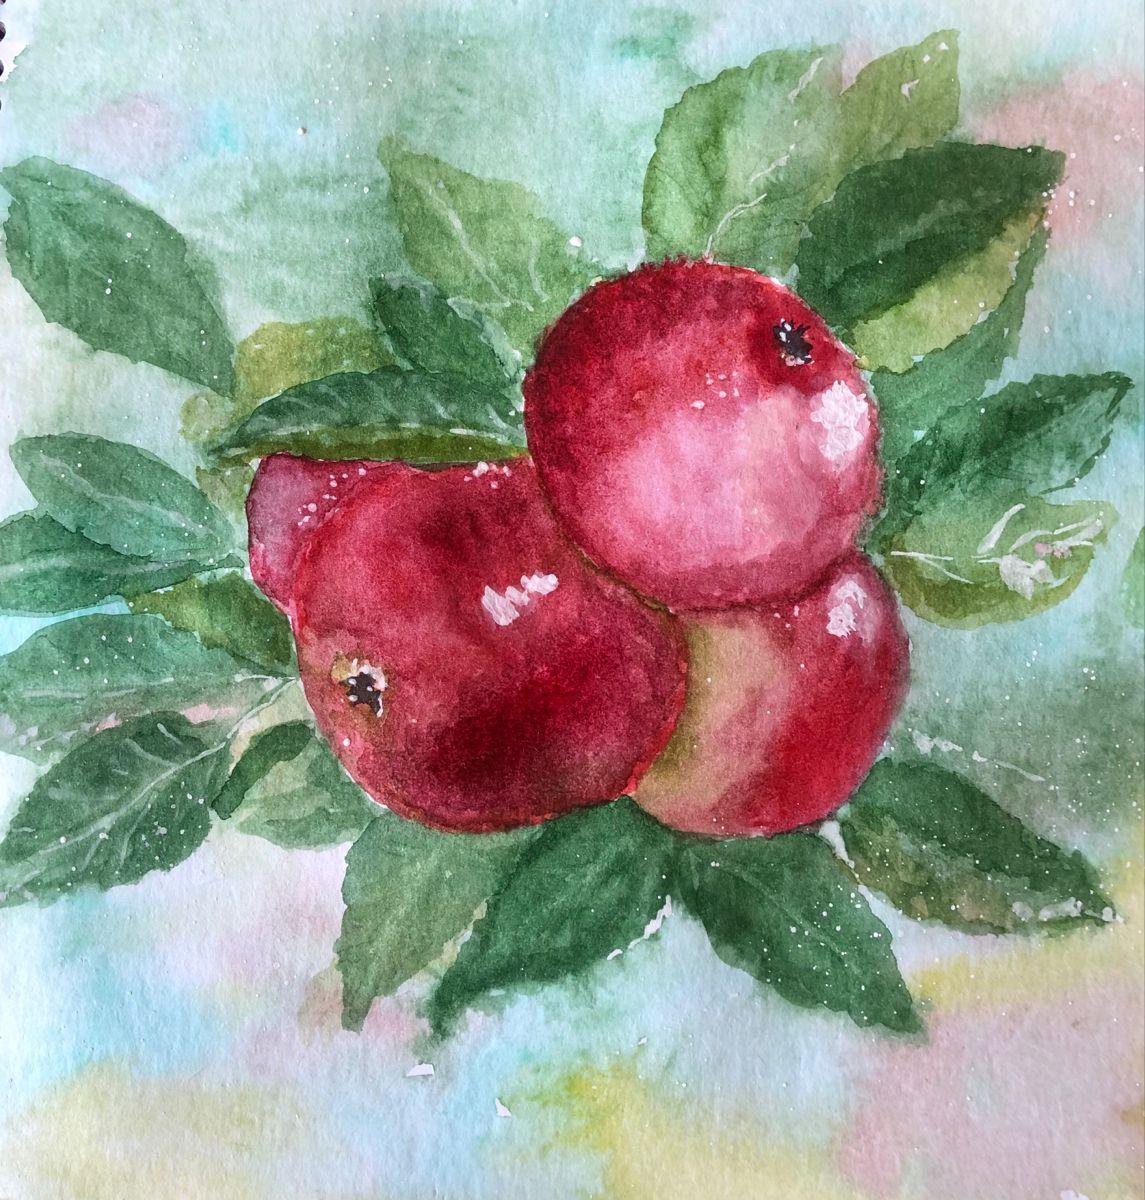 Apples #apple #watercolor #watercolorpainting #watercolorsketch #watercolorillustration #art #illustration #акварель #акварельныйрисунок